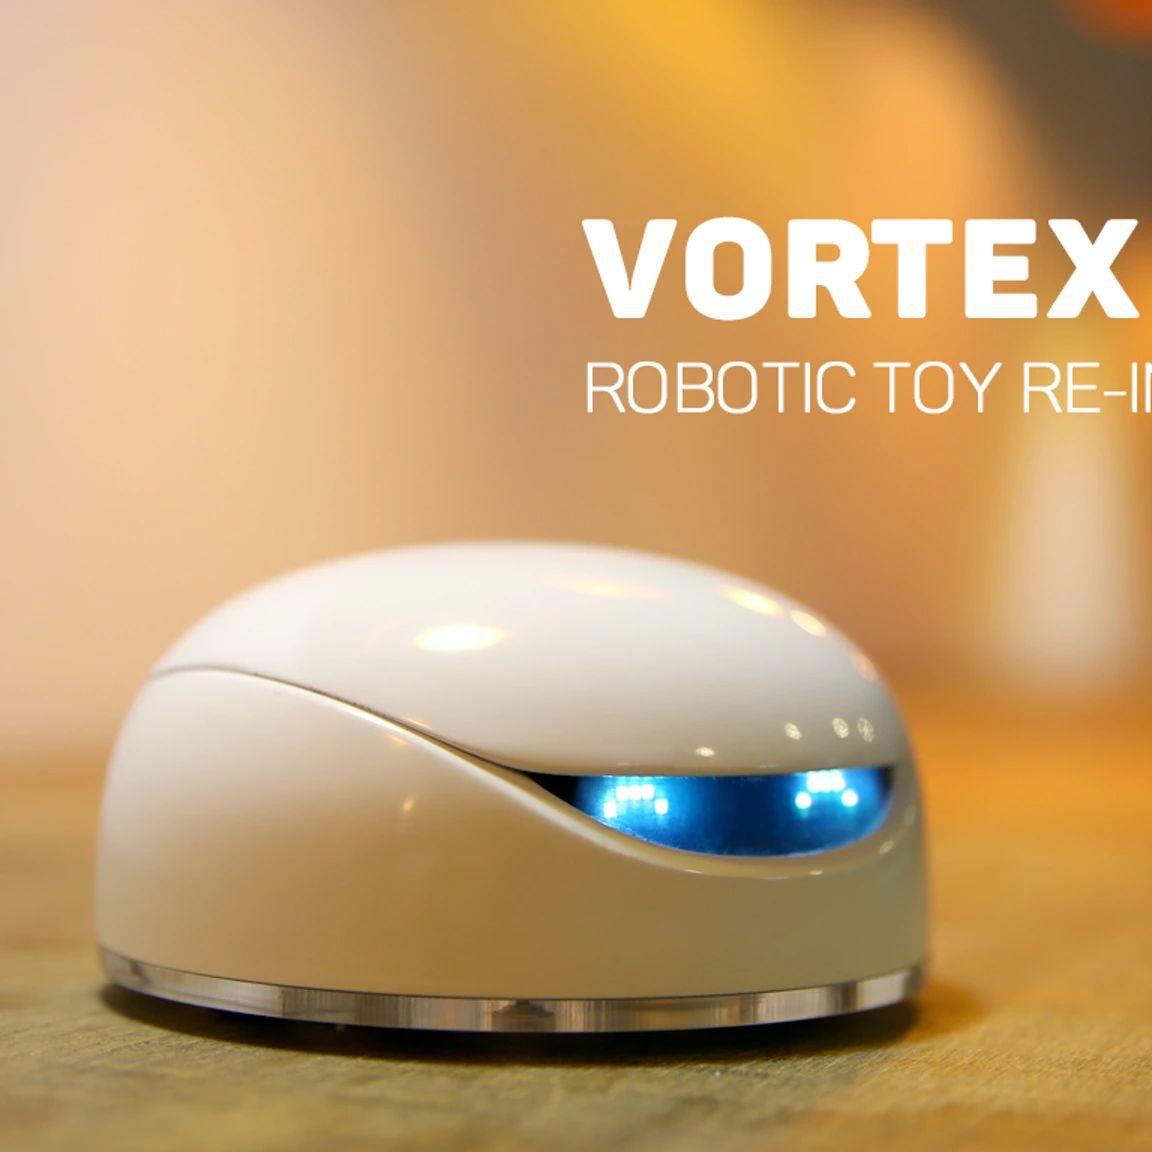 vortex 智能玩具机器人